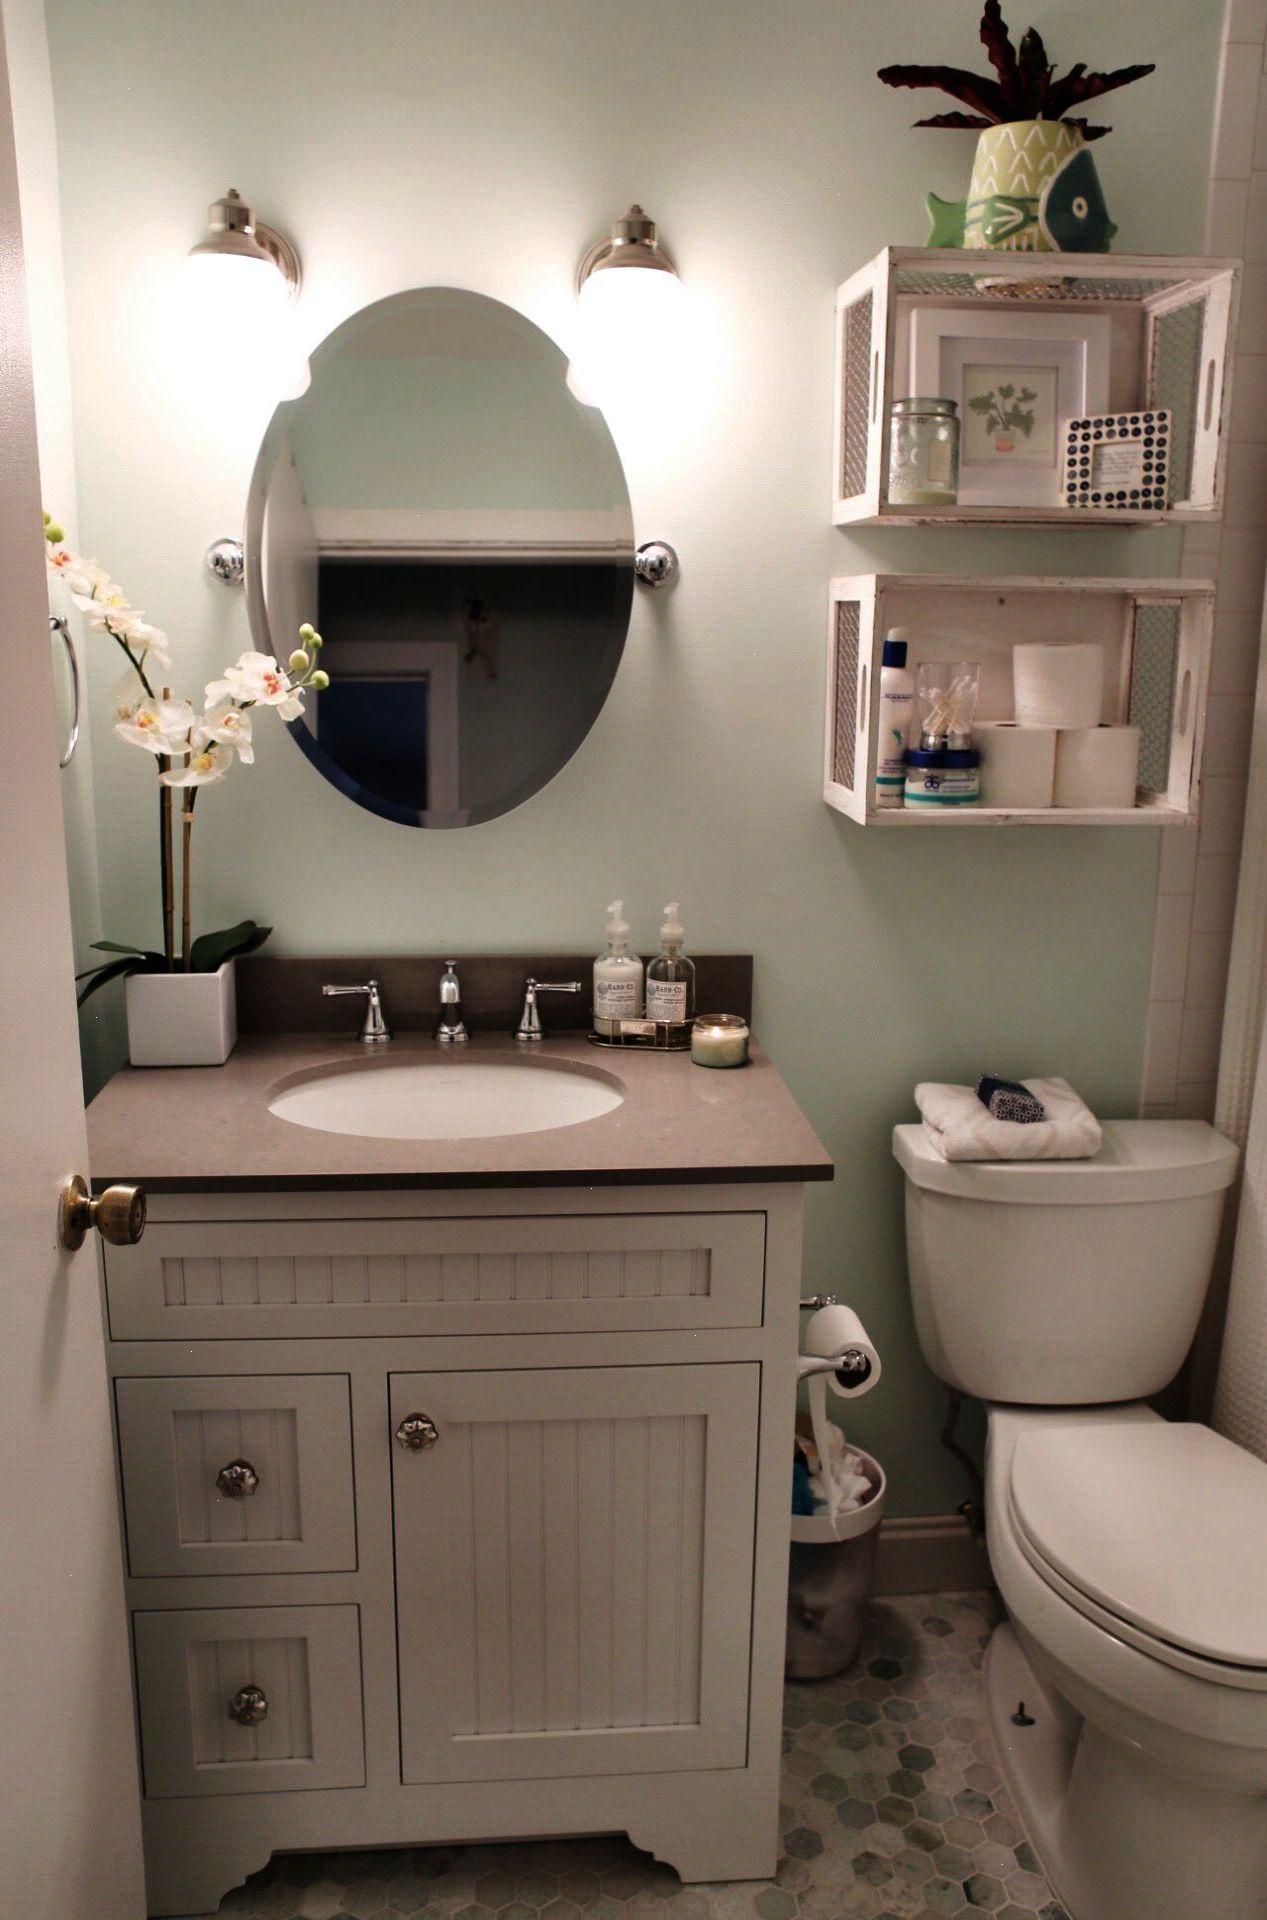 Sleek Bathroom Inspiration  June, 2018